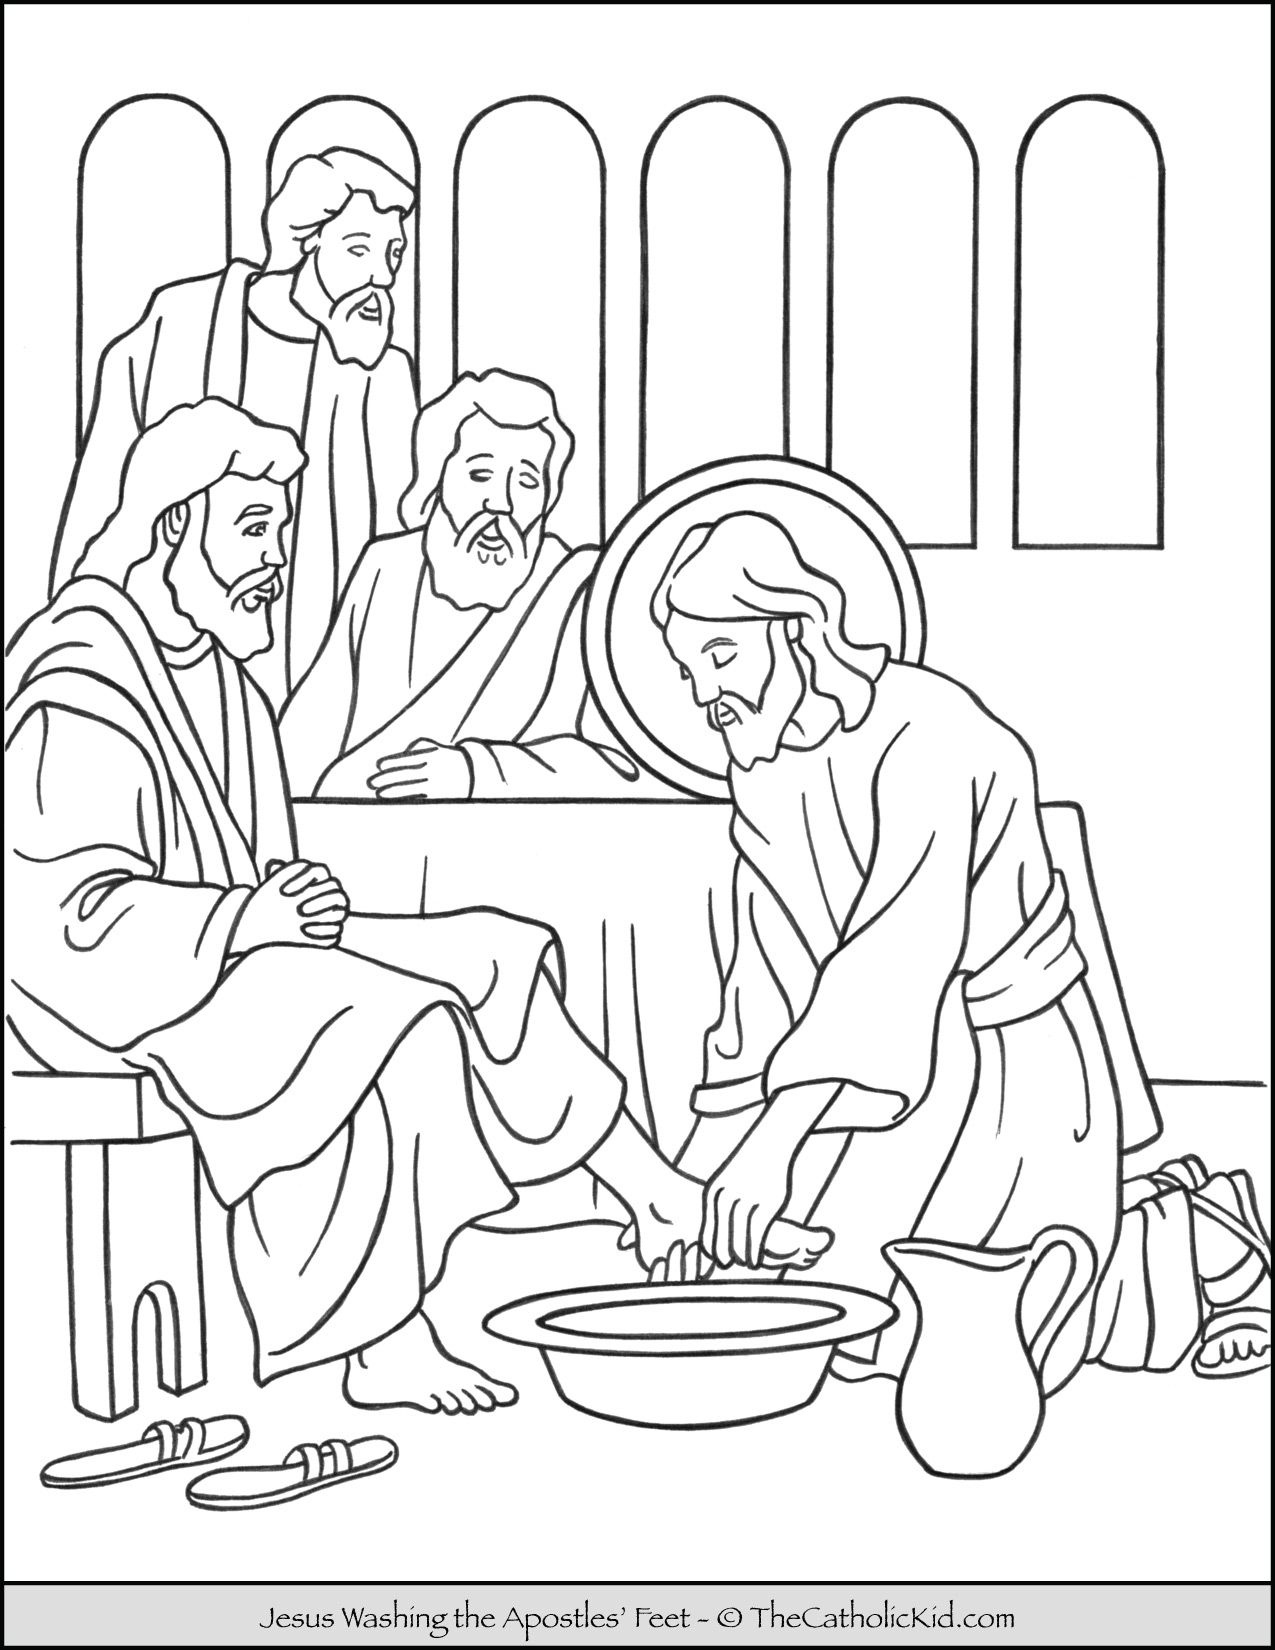 Jesus Washing Feet Coloring Sheets 10 Image Sunday School